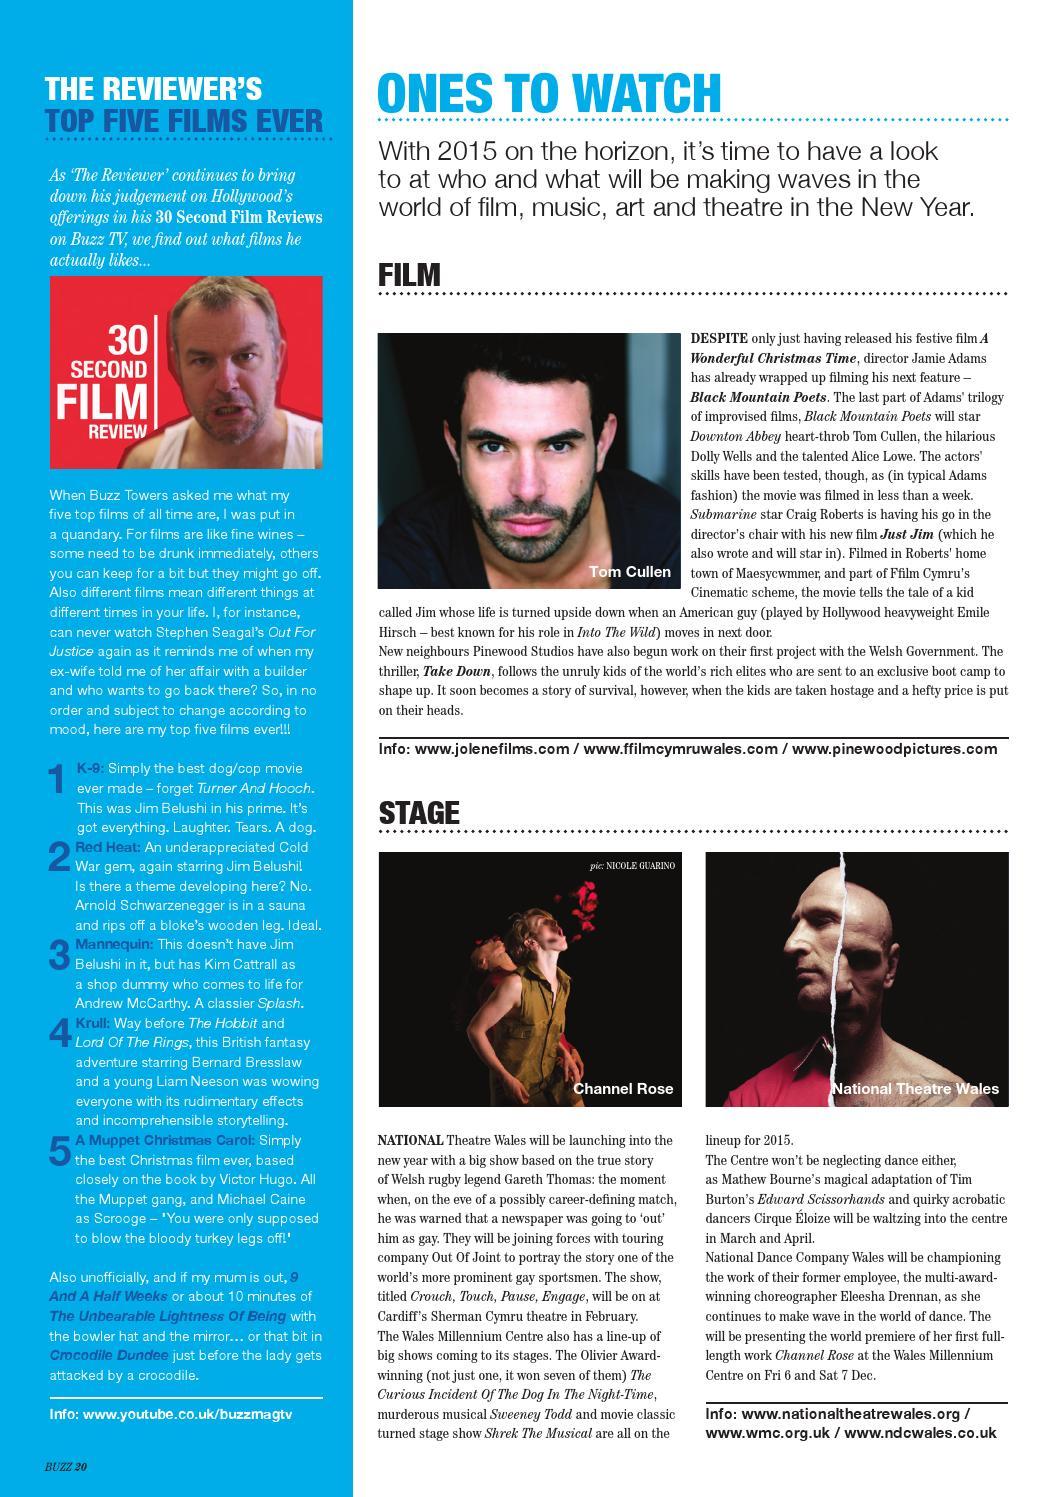 Buzz Magazine - Dec 2014/Jan 2015 - Film & Festive Issue by